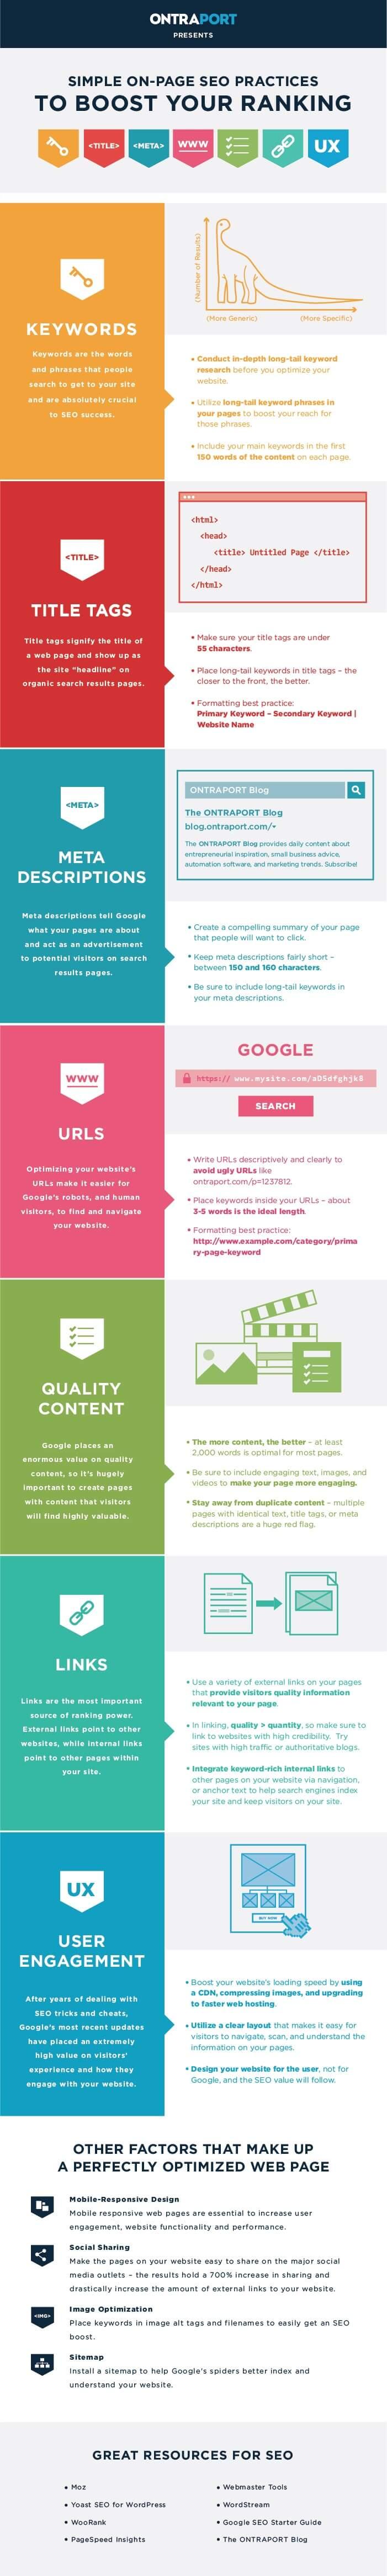 SEO-infographic-best-practices